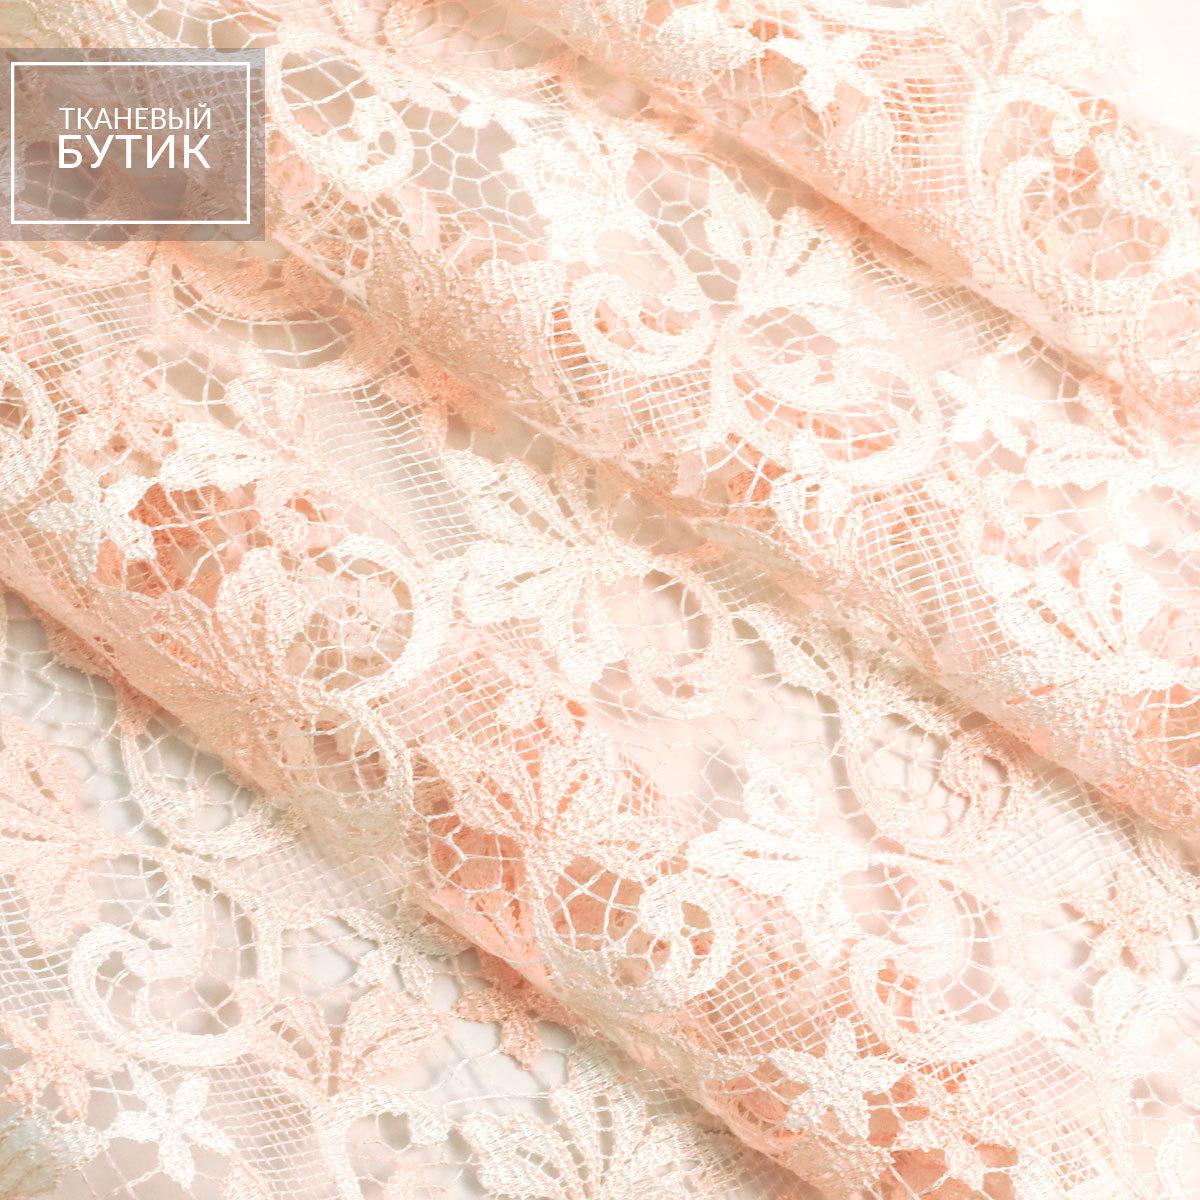 Мягкое розово-белое кружево